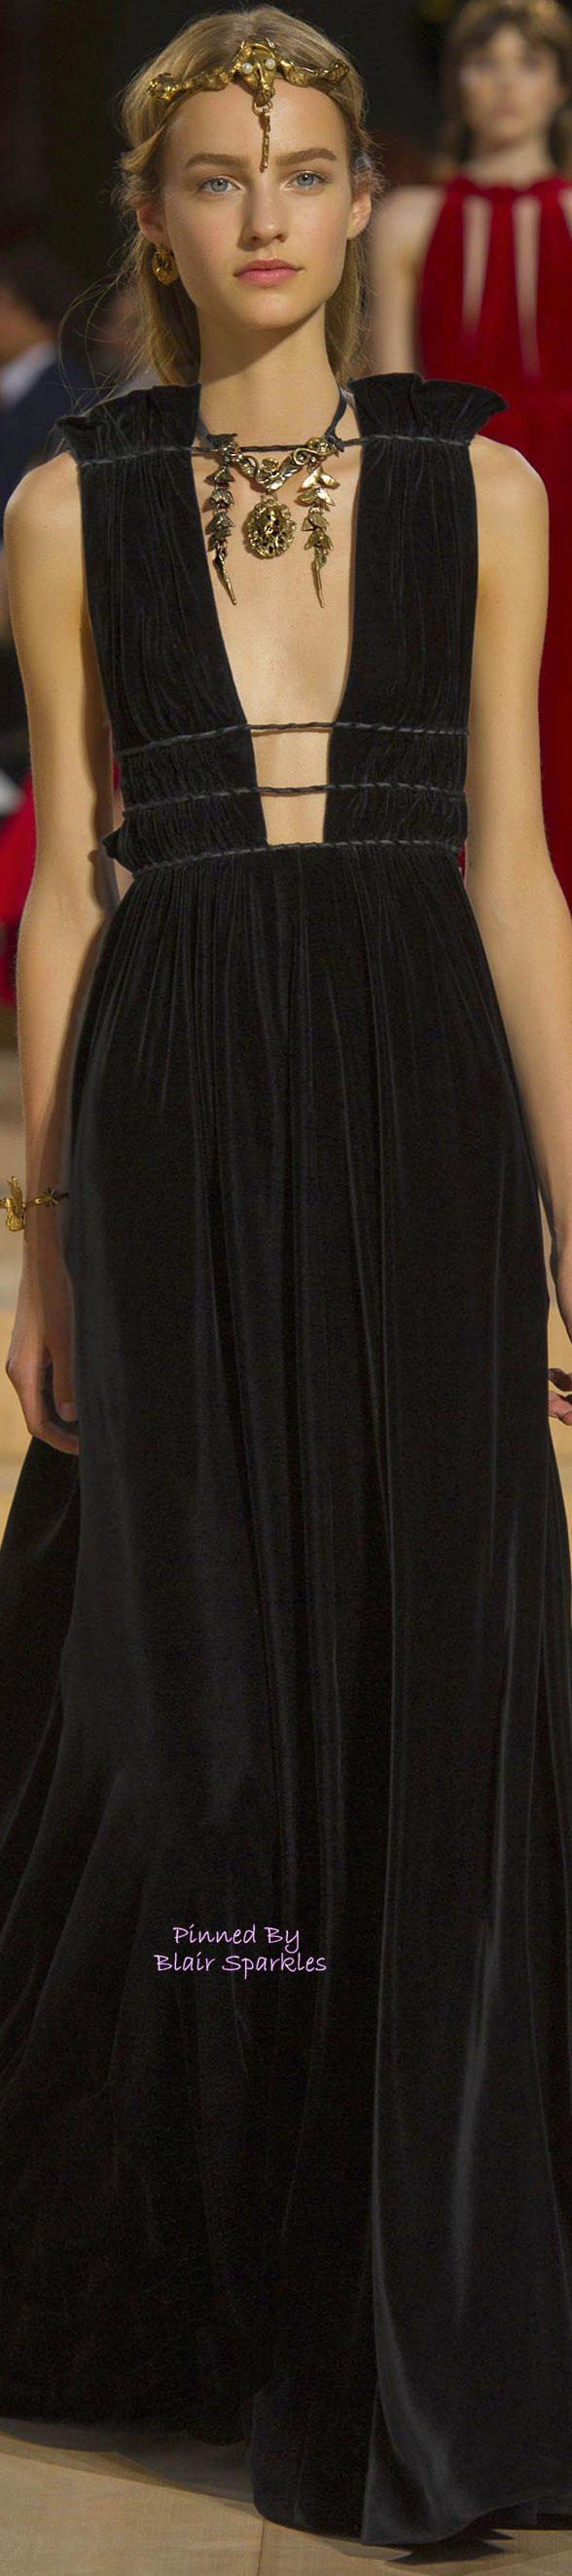 Modern Goddess Haute Gown. FALL COUTURE 2015 VALENTINO (Rome) ~ ♕♚εїз | BLAIR SPARKLES |